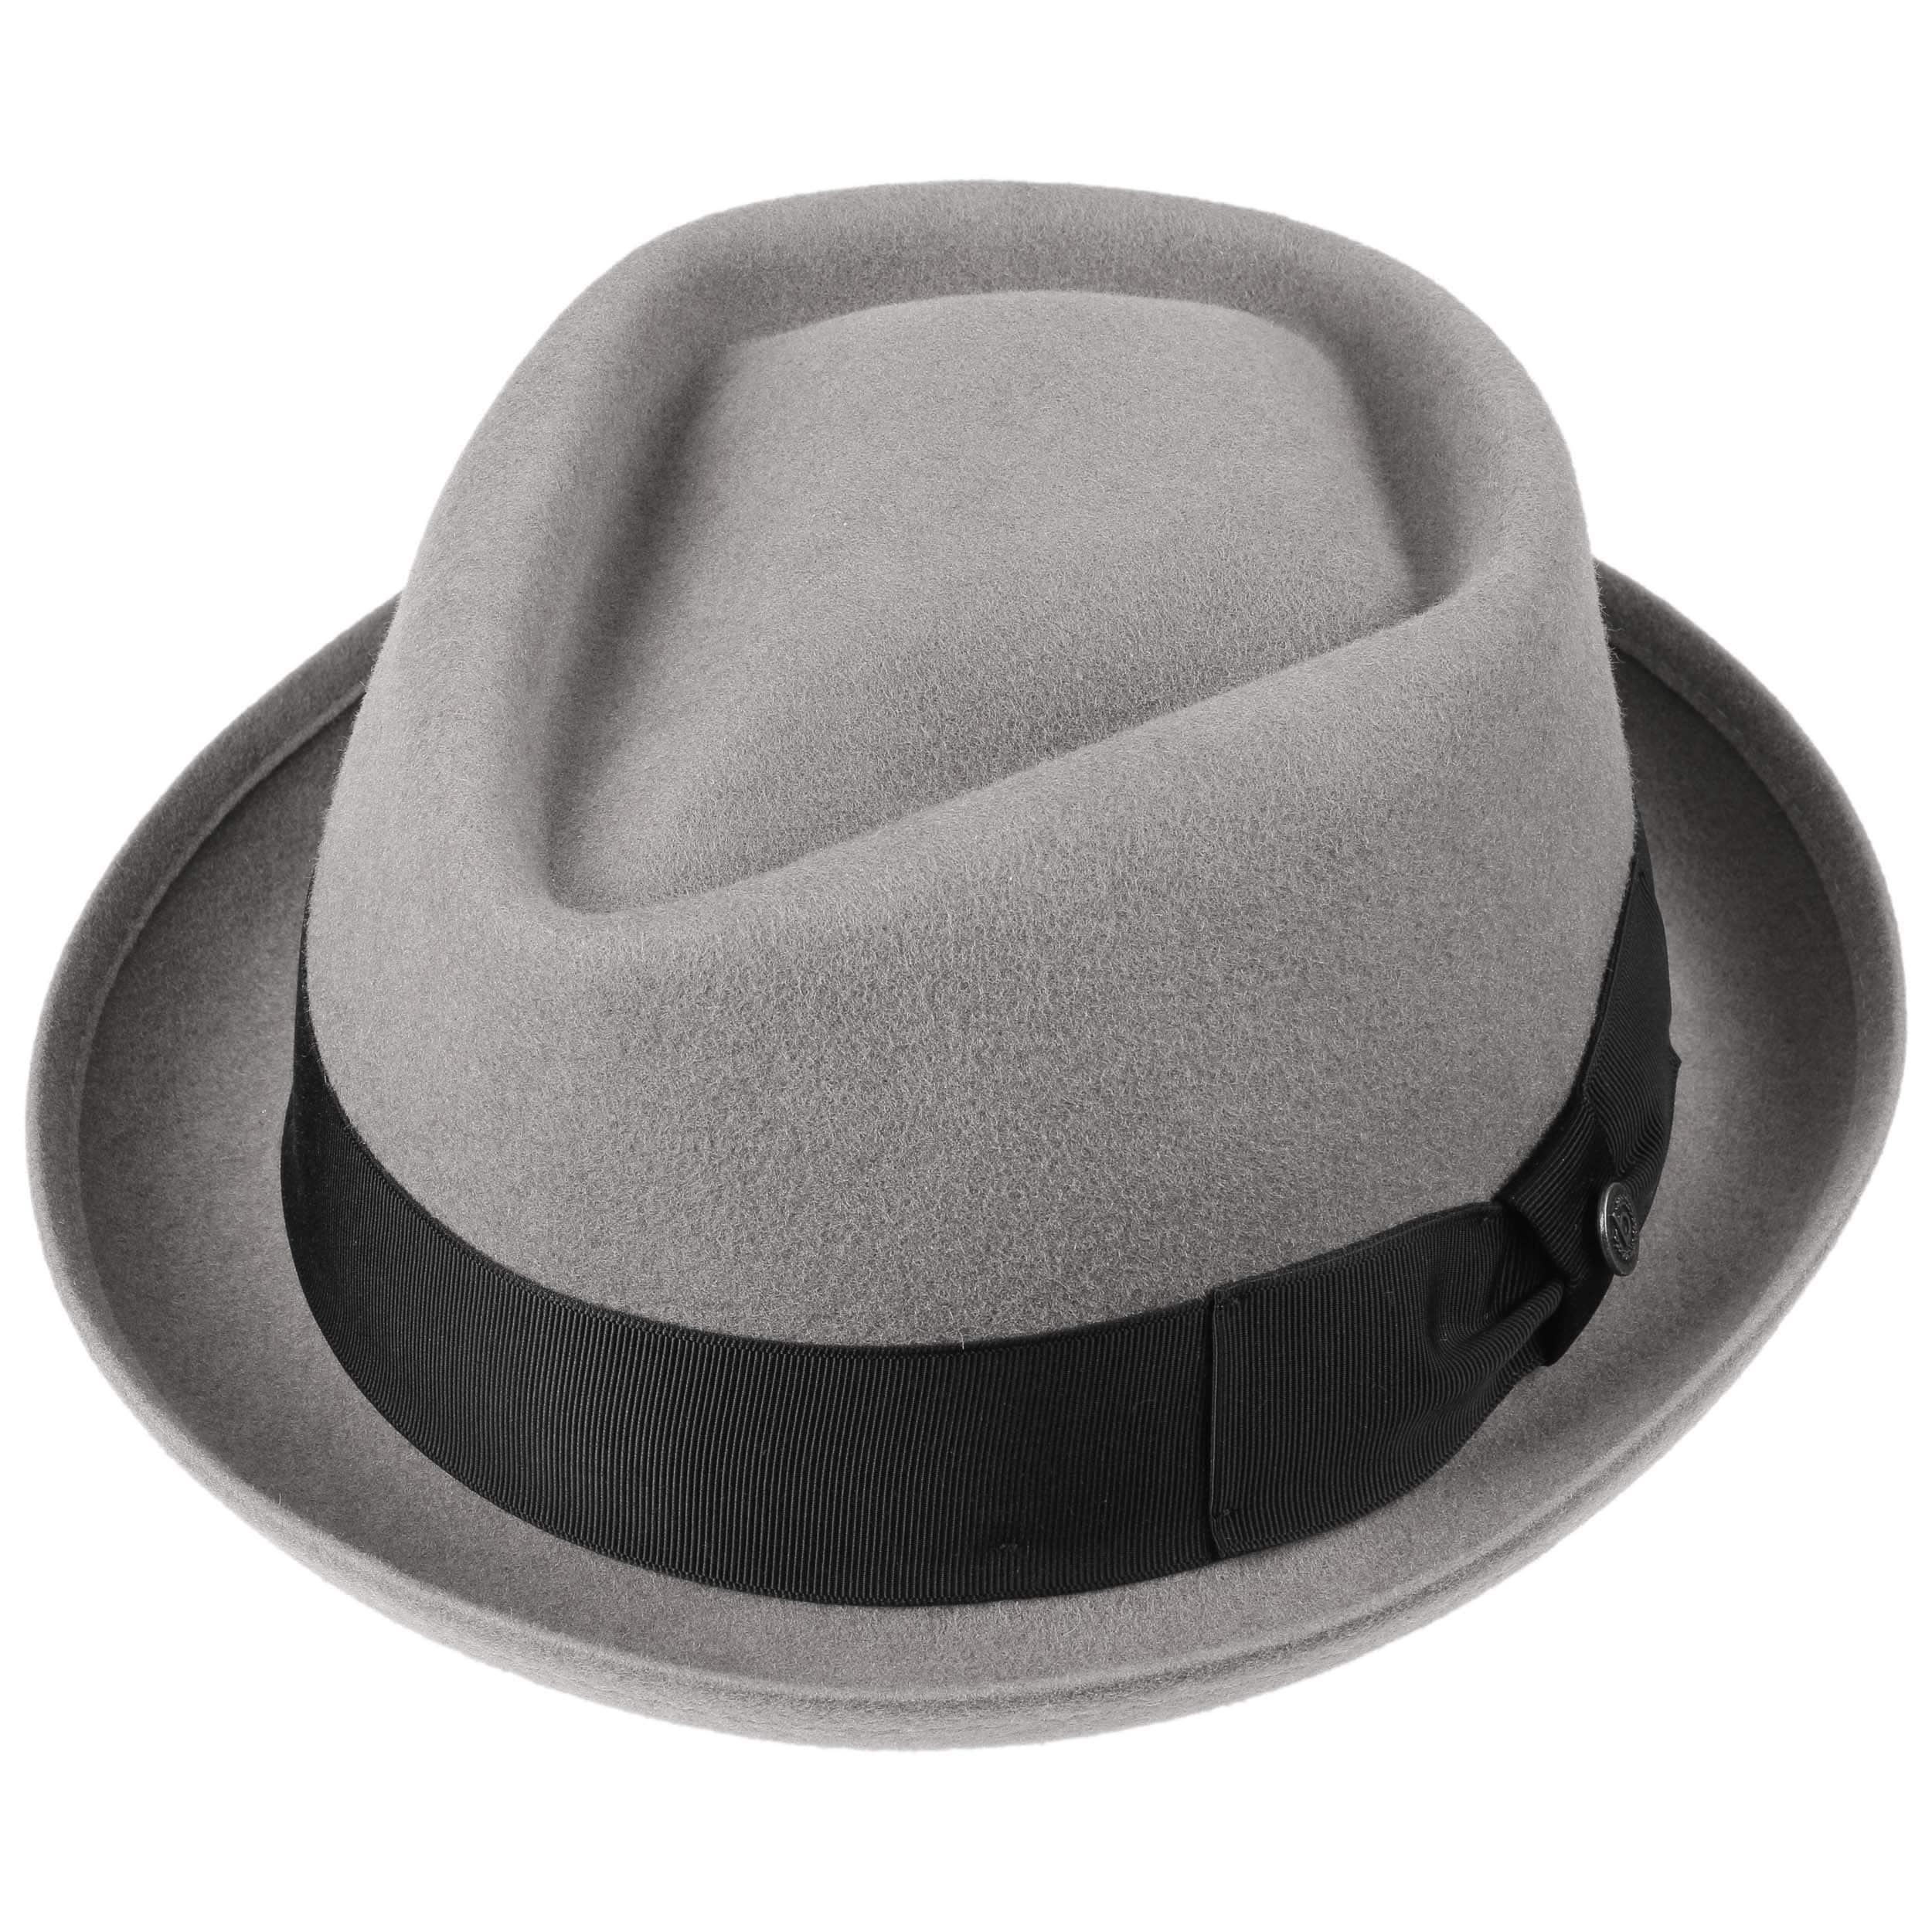 65757efd17c Reighsbury Porkpie Hat by bugatti - grey 1 ...